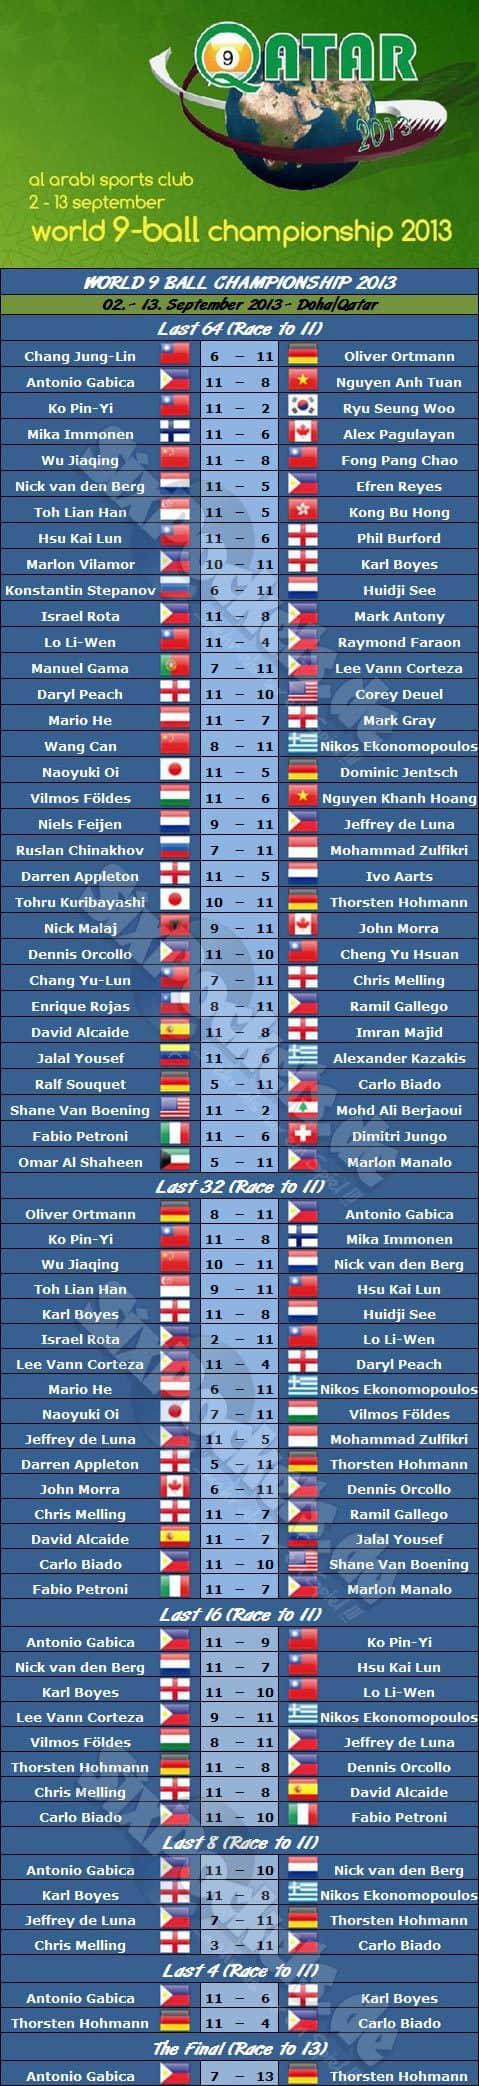 world_9_ball_championship_2013_draw